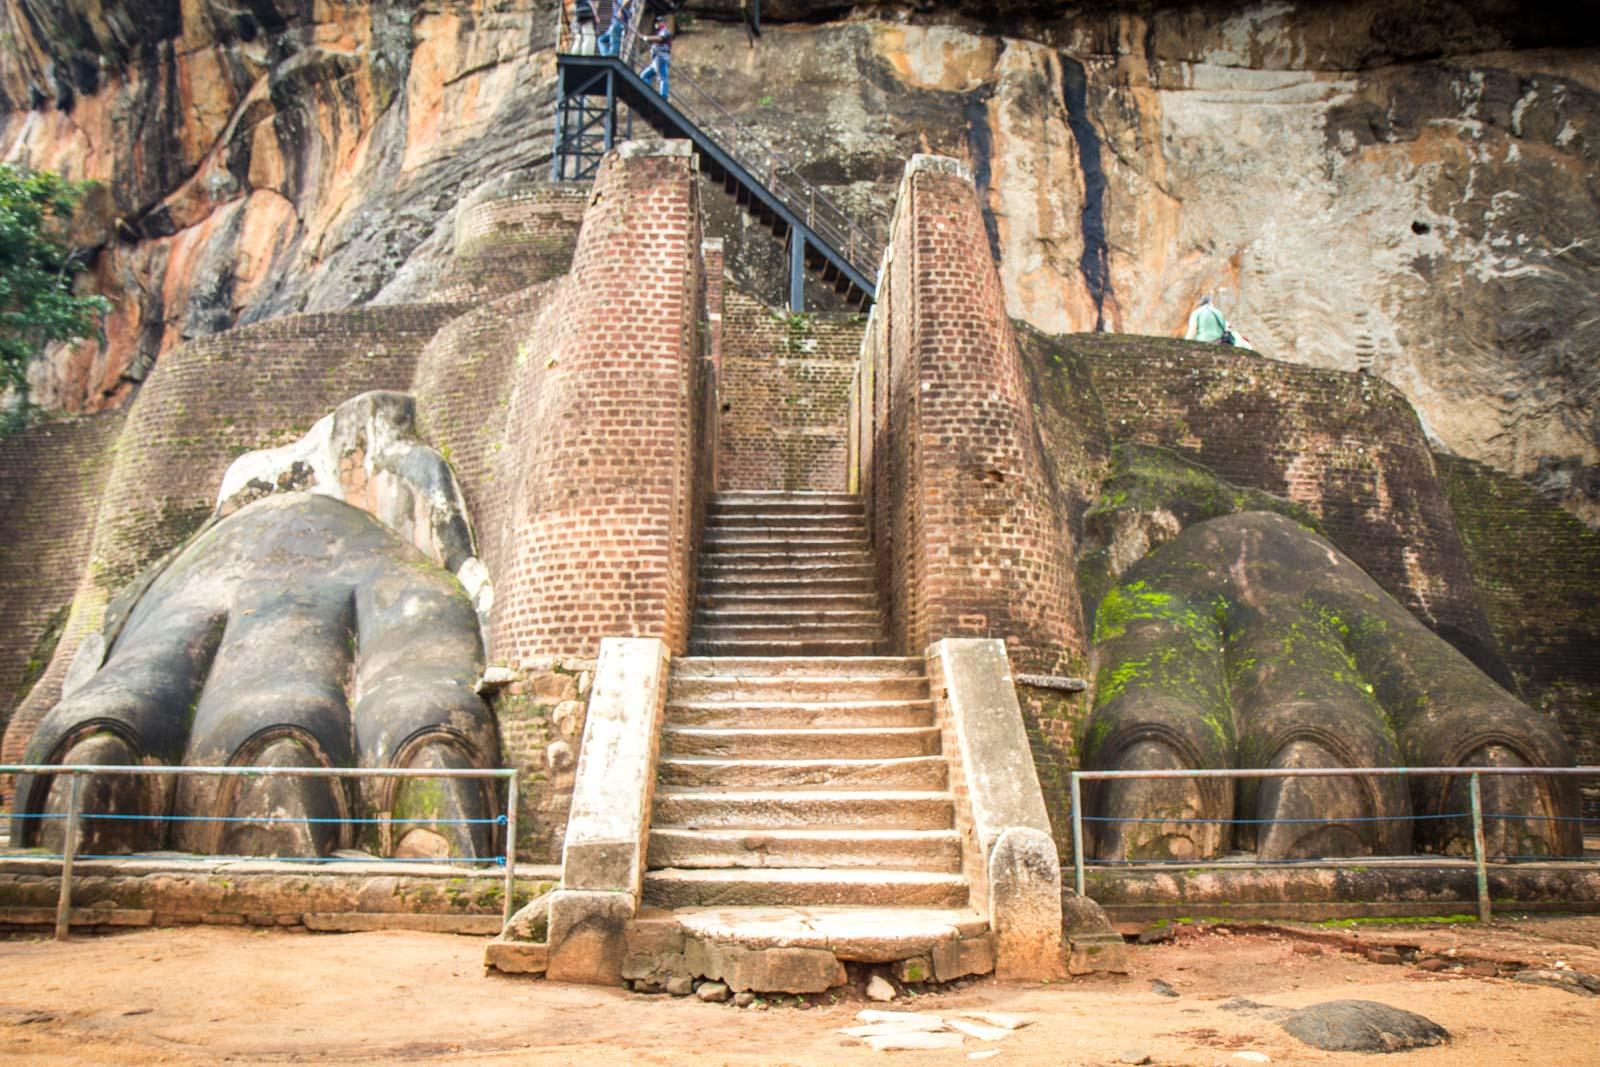 Visiting Sigiriya, Sri Lanka